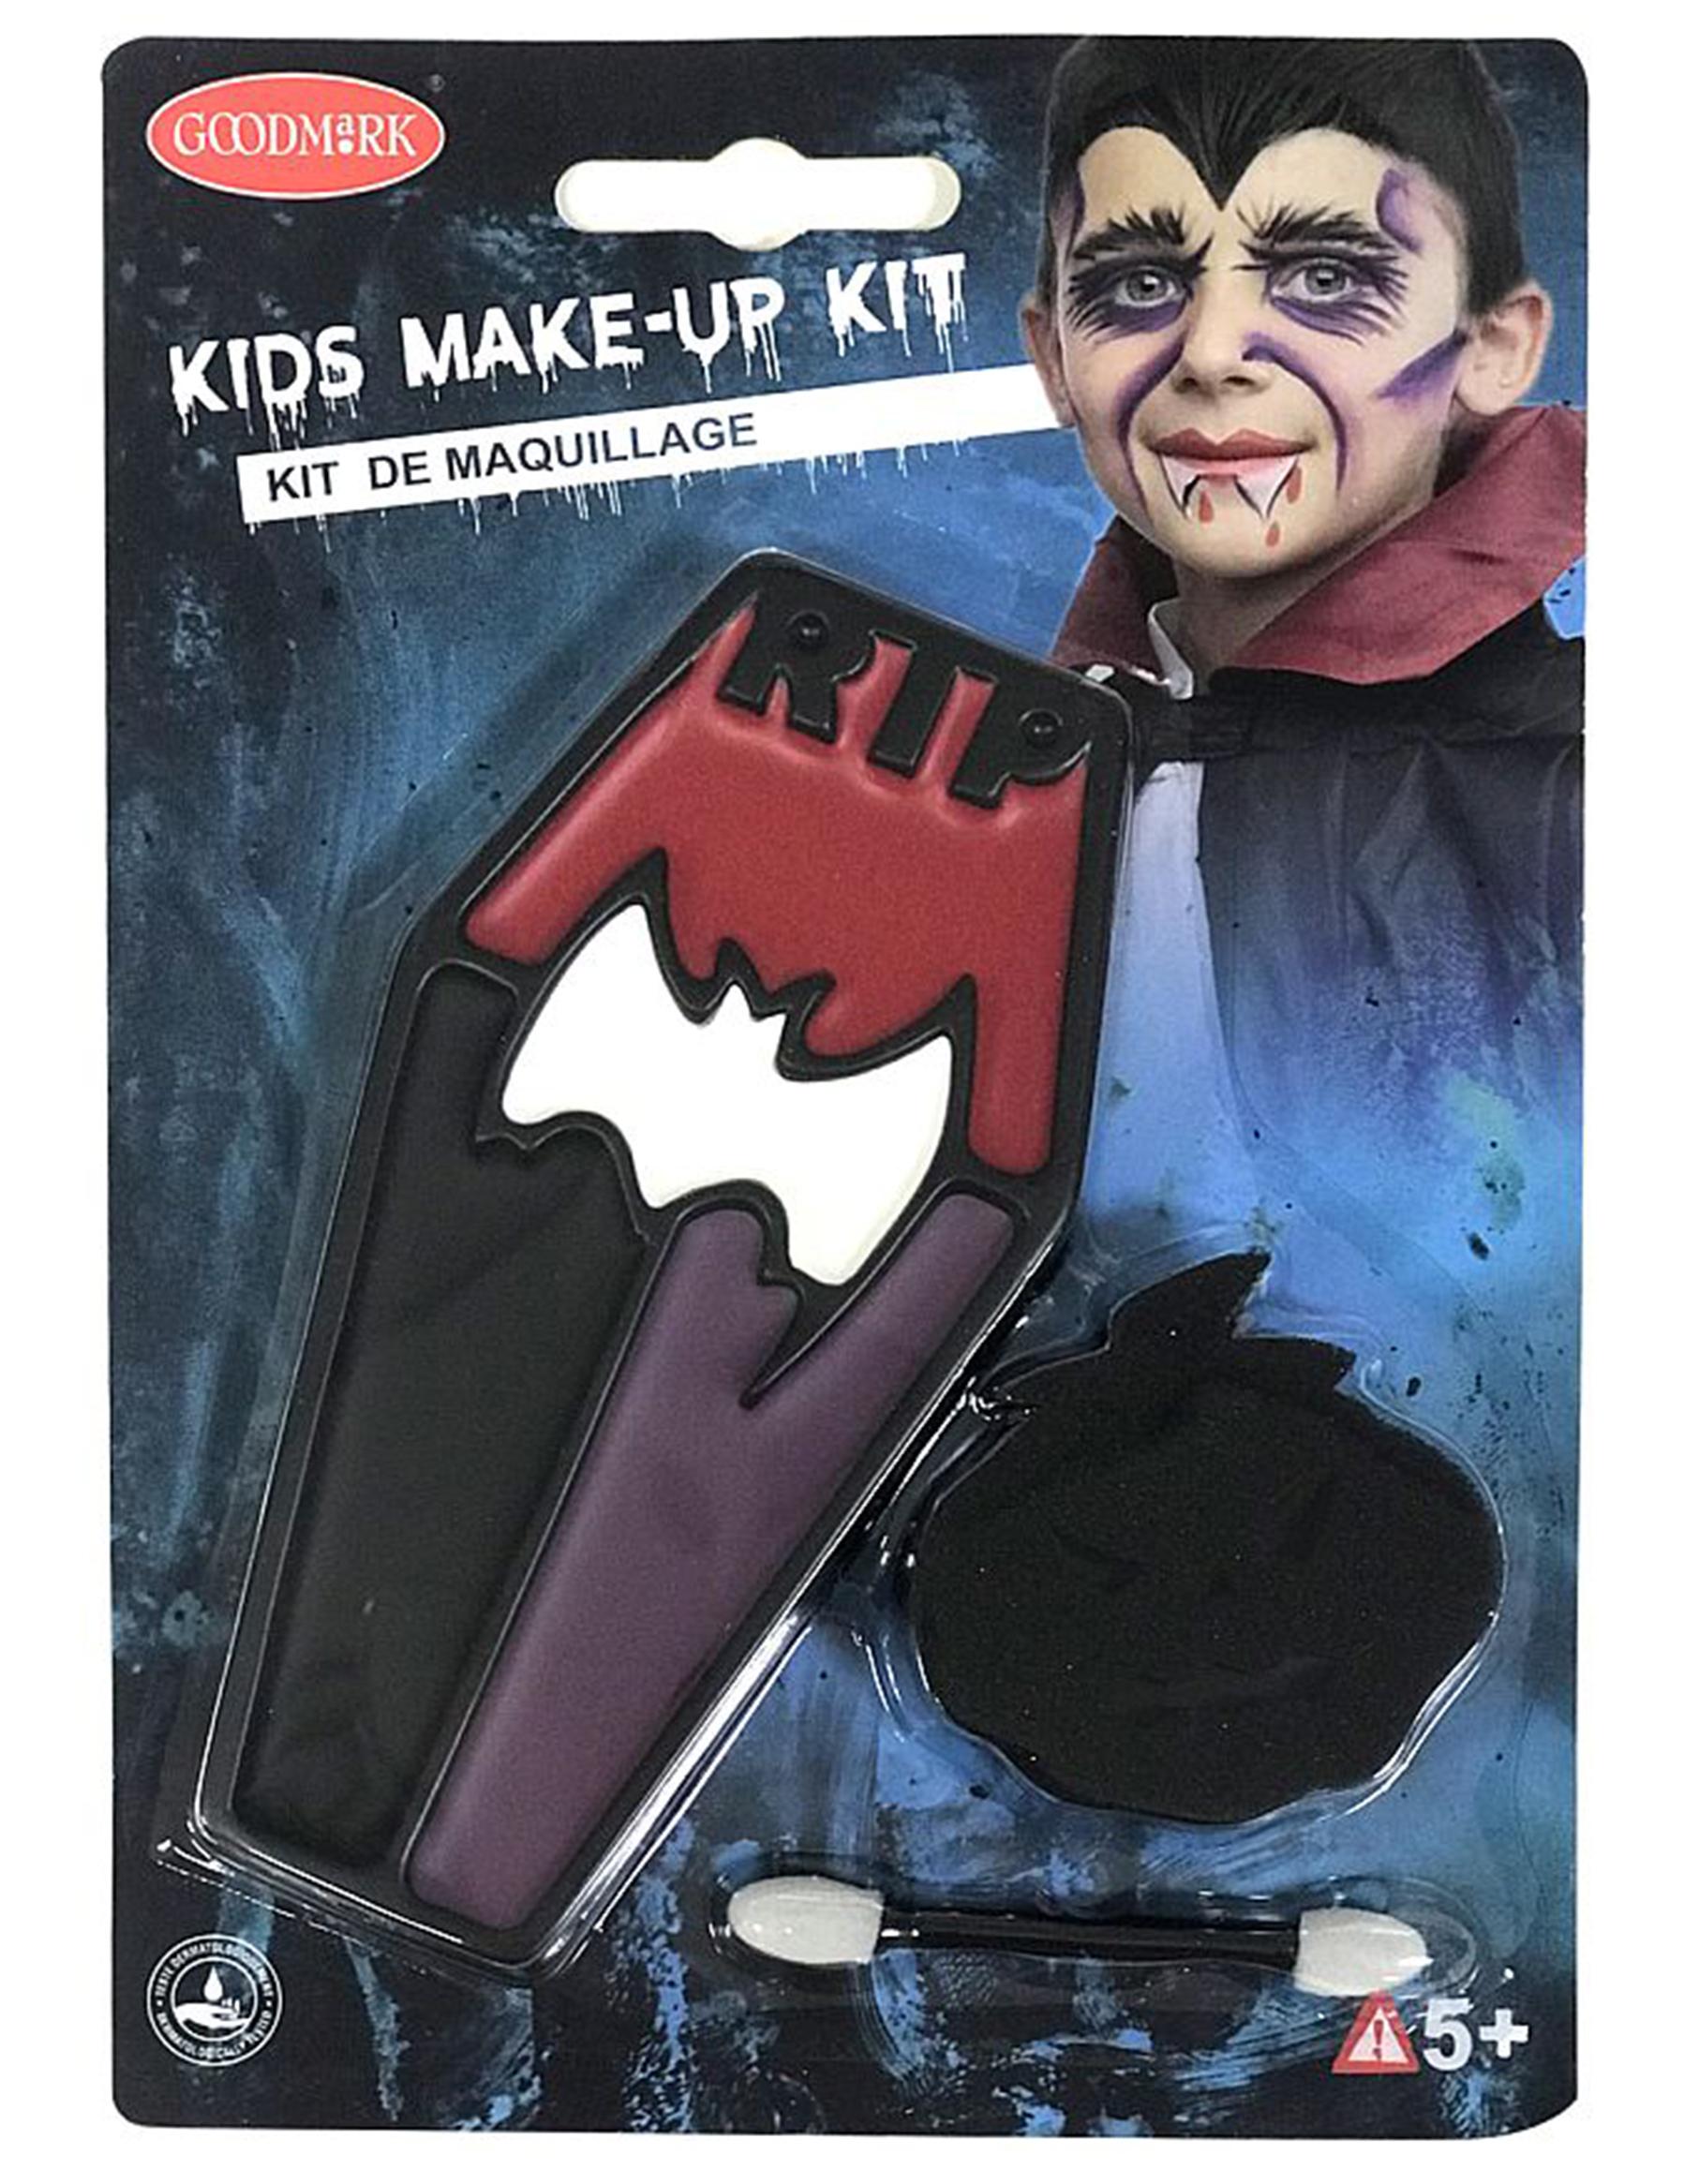 Vampirschminkset Fur Kinder Halloween Makeup 3 Teilig Schwarz Rot